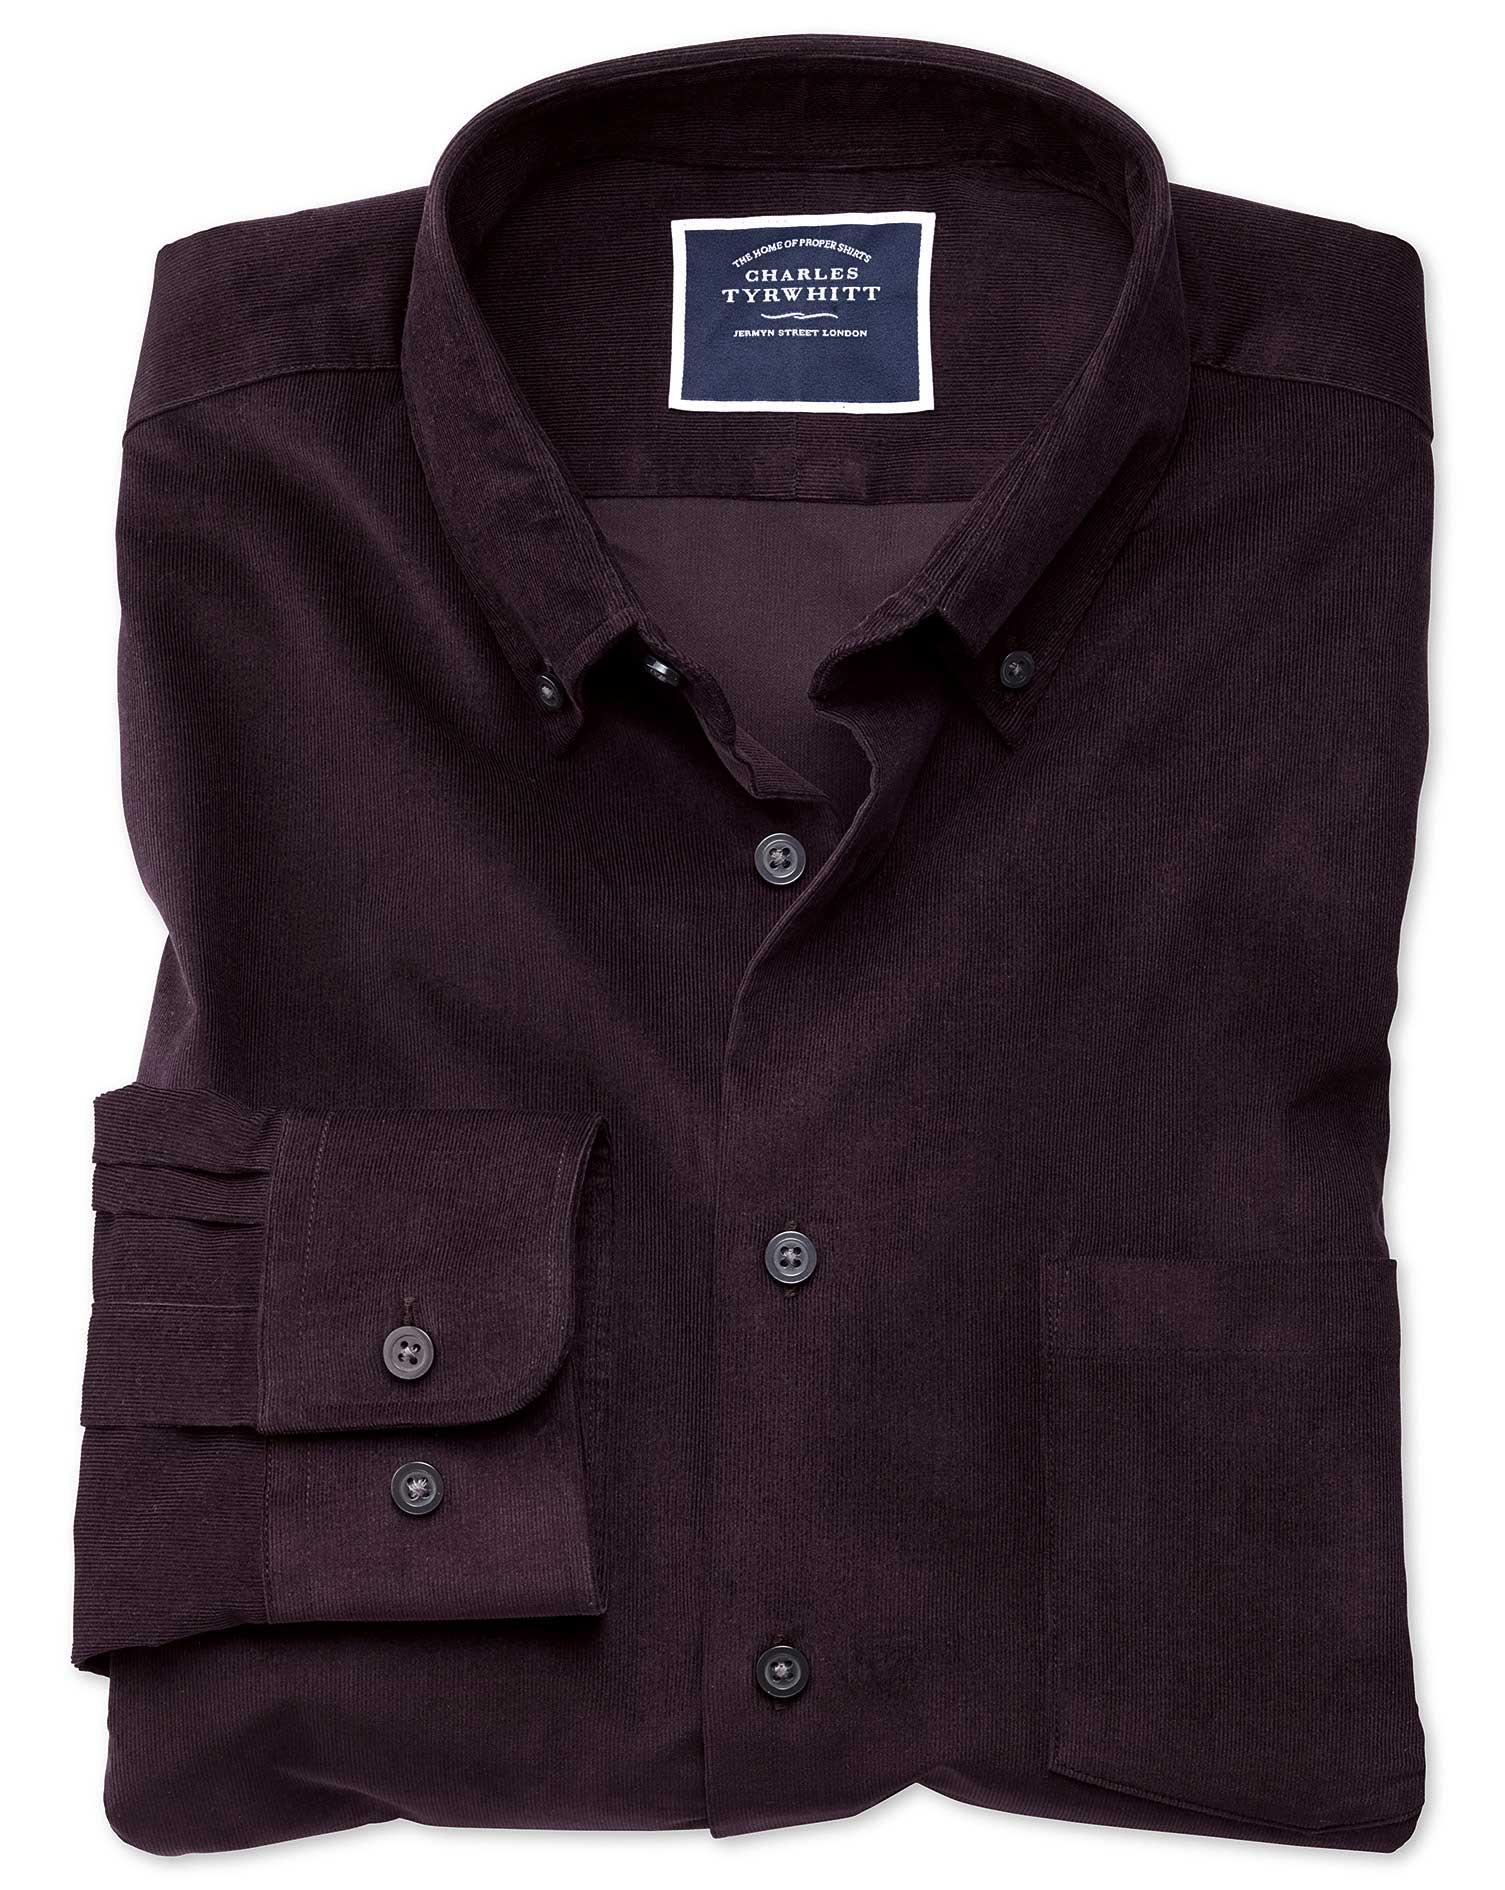 Extra Slim Fit Plain Dark Purple Fine Corduroy Cotton Shirt Single Cuff Size XS by Charles Tyrwhitt